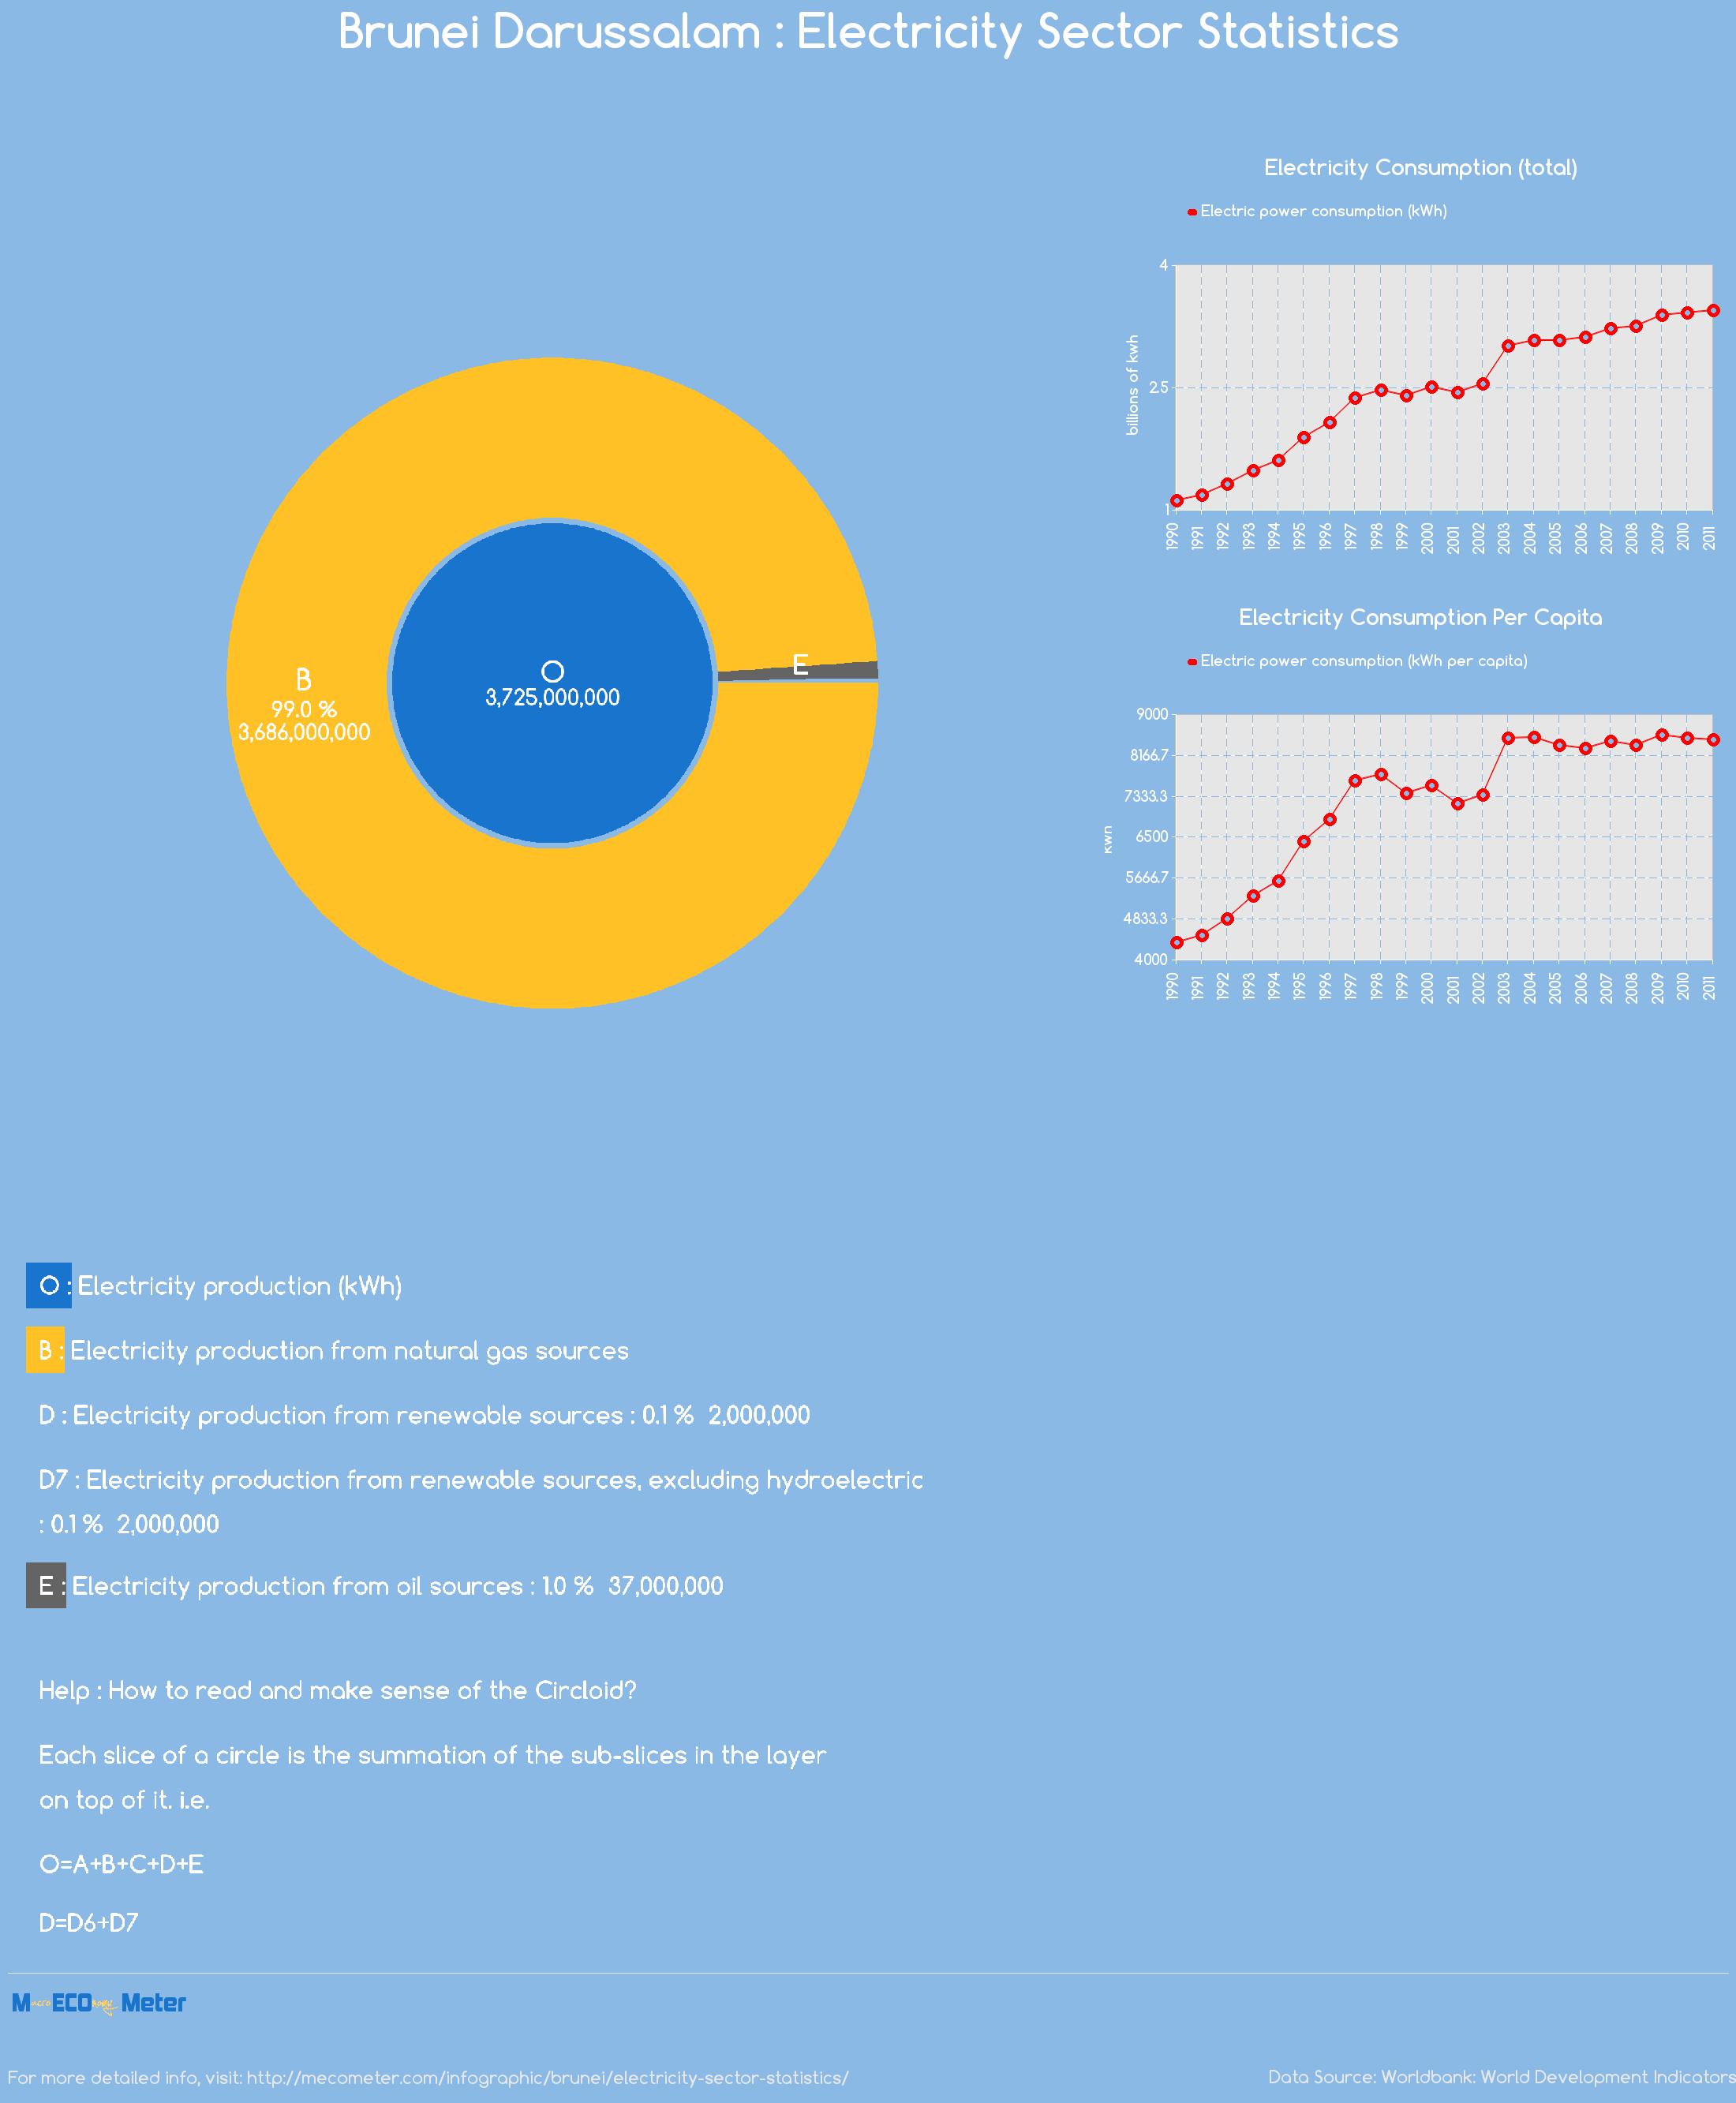 Brunei : Electricity Sector Statistics